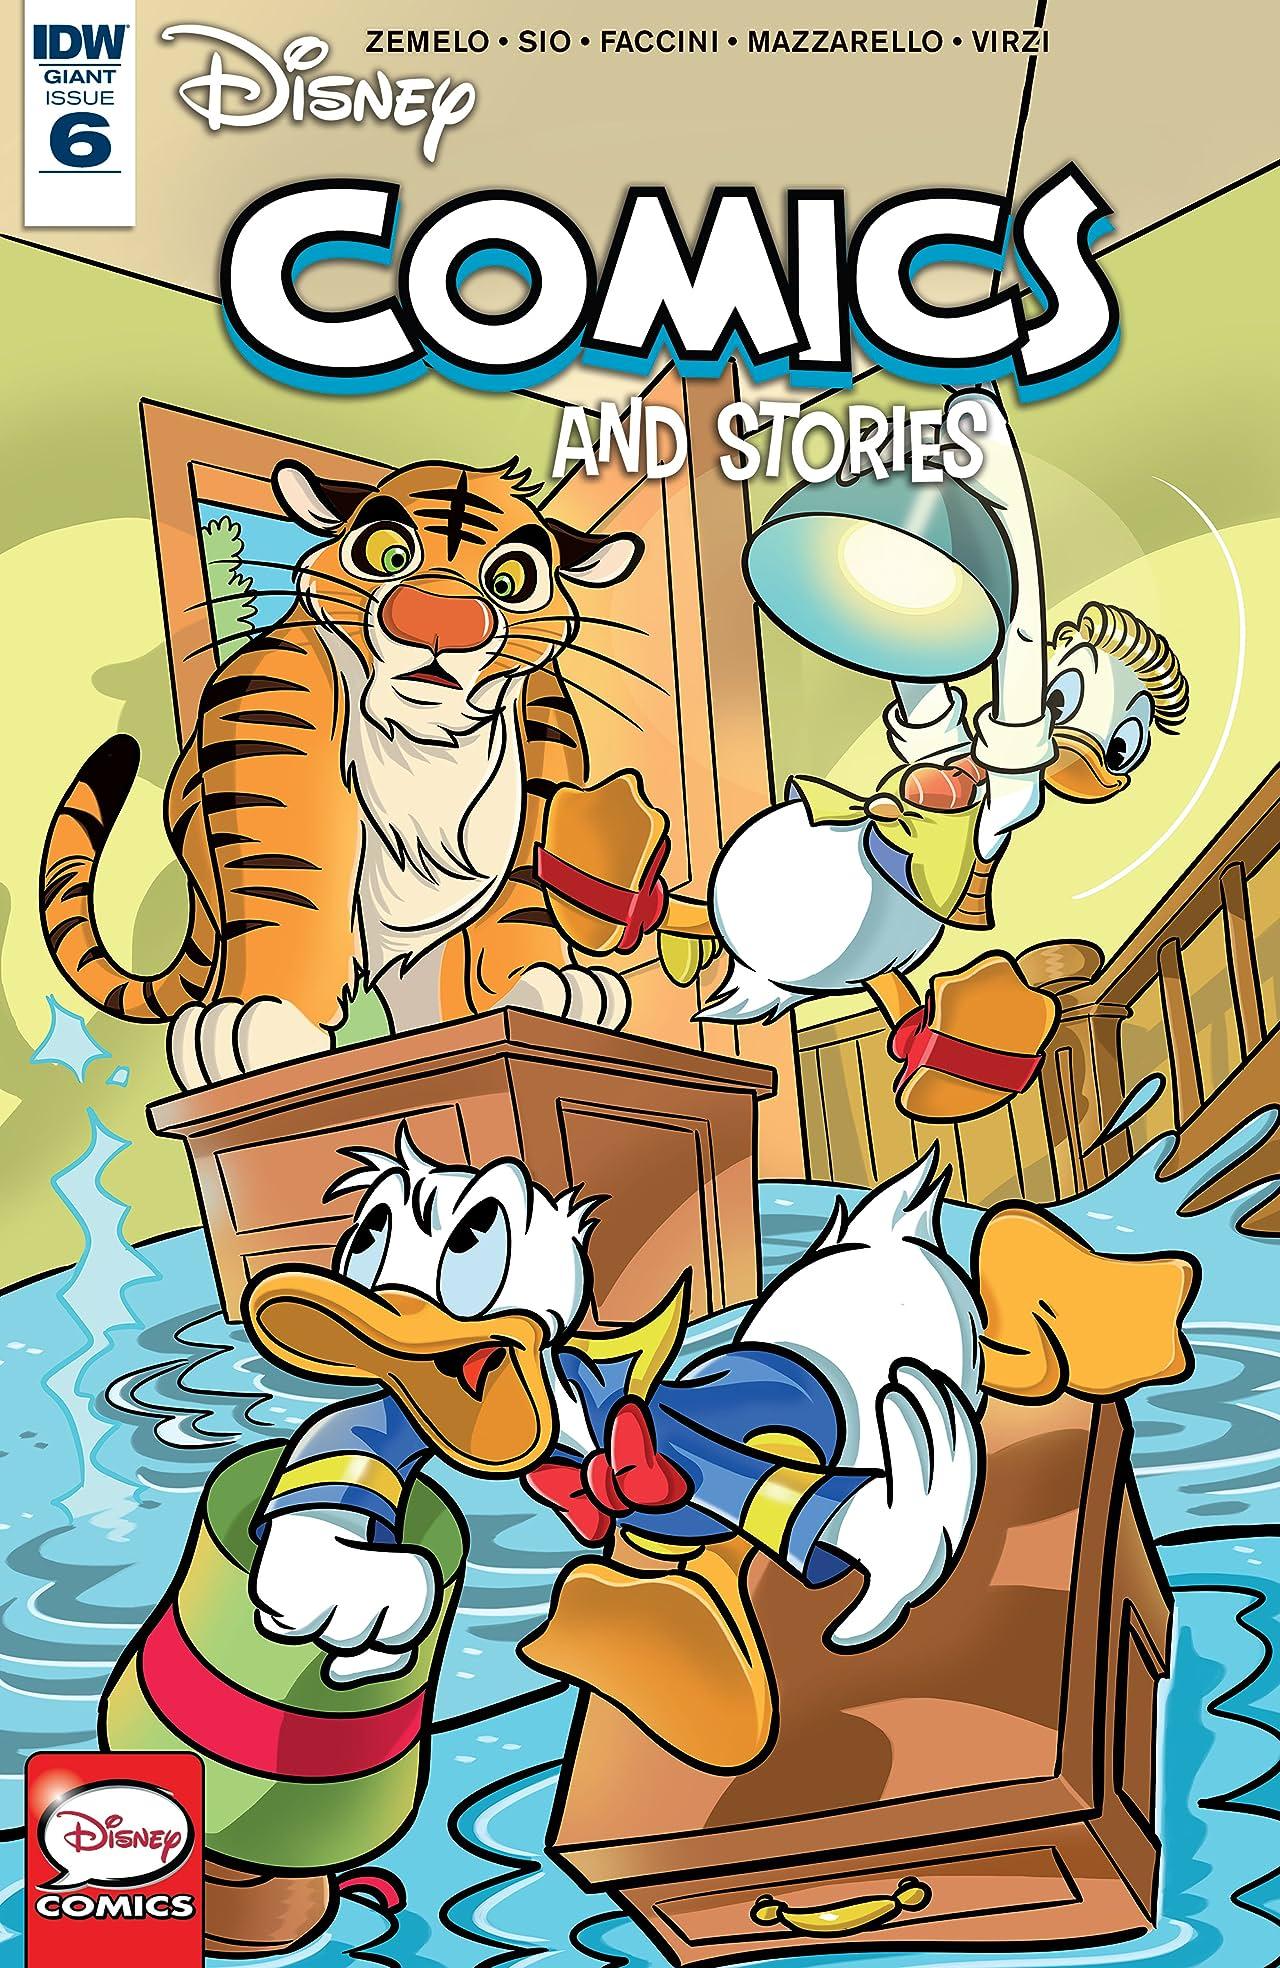 Disney Comics and Stories #6